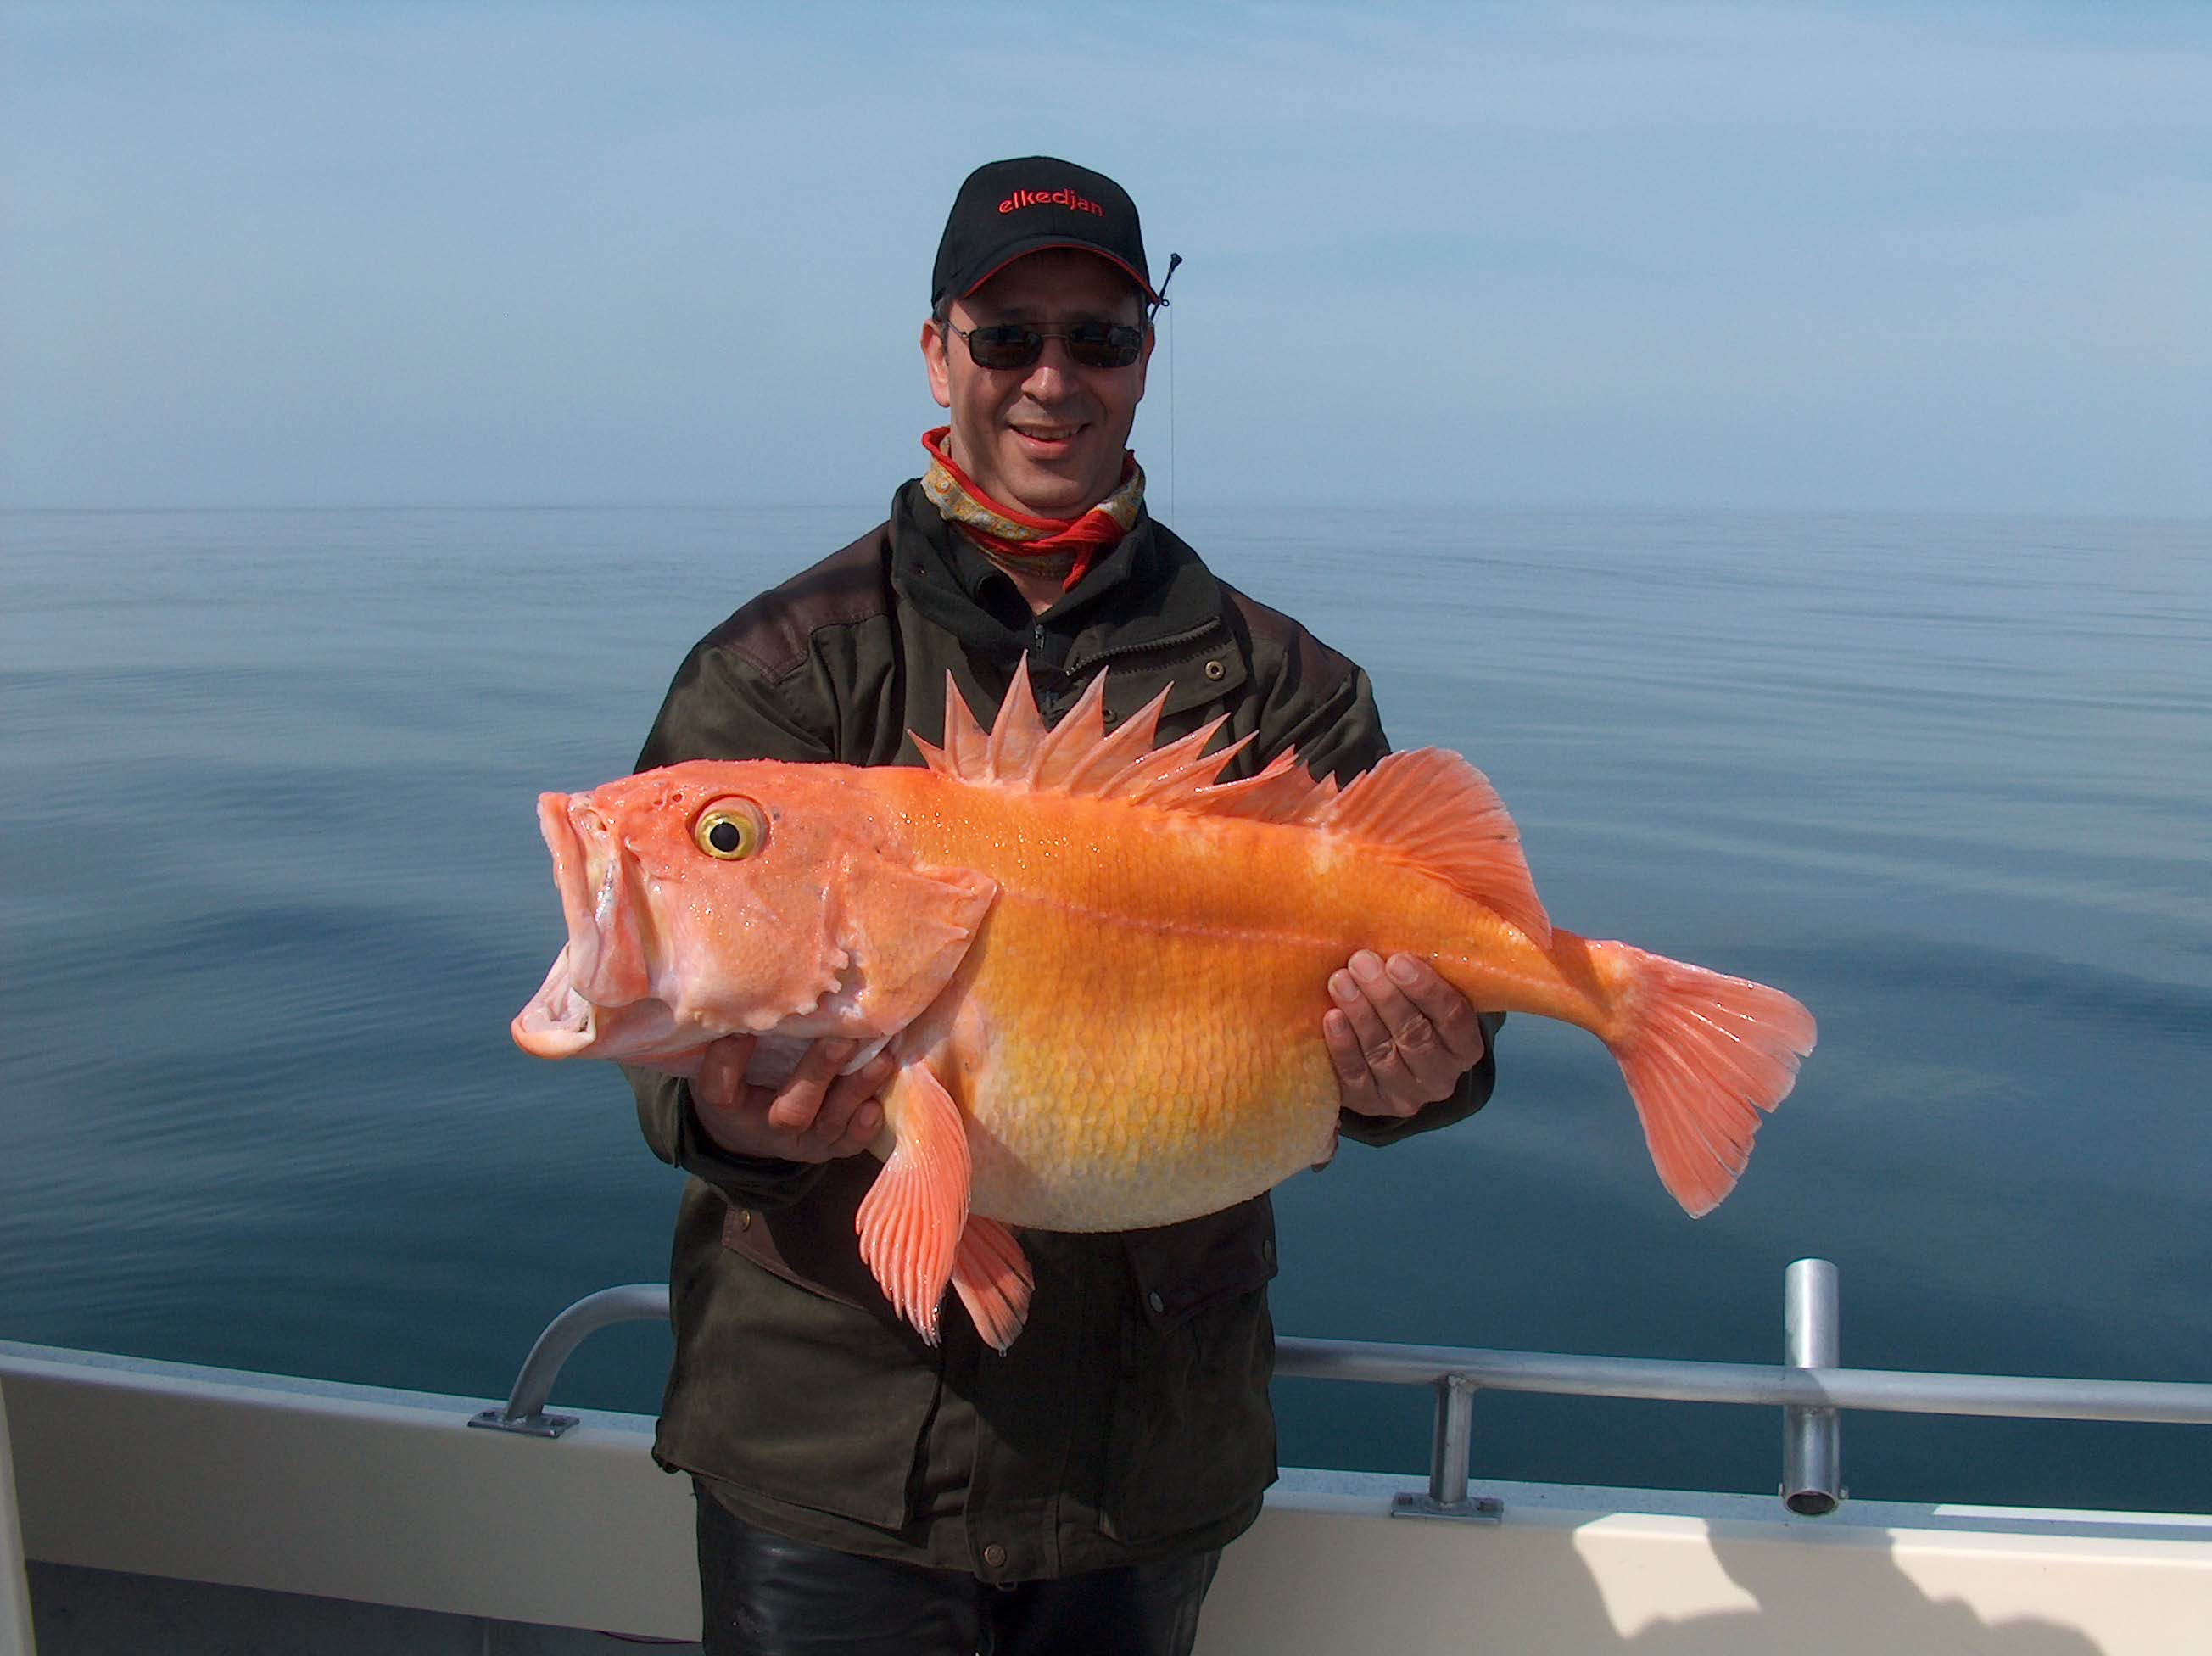 Full Day Fishing Charters From Seward Alaska